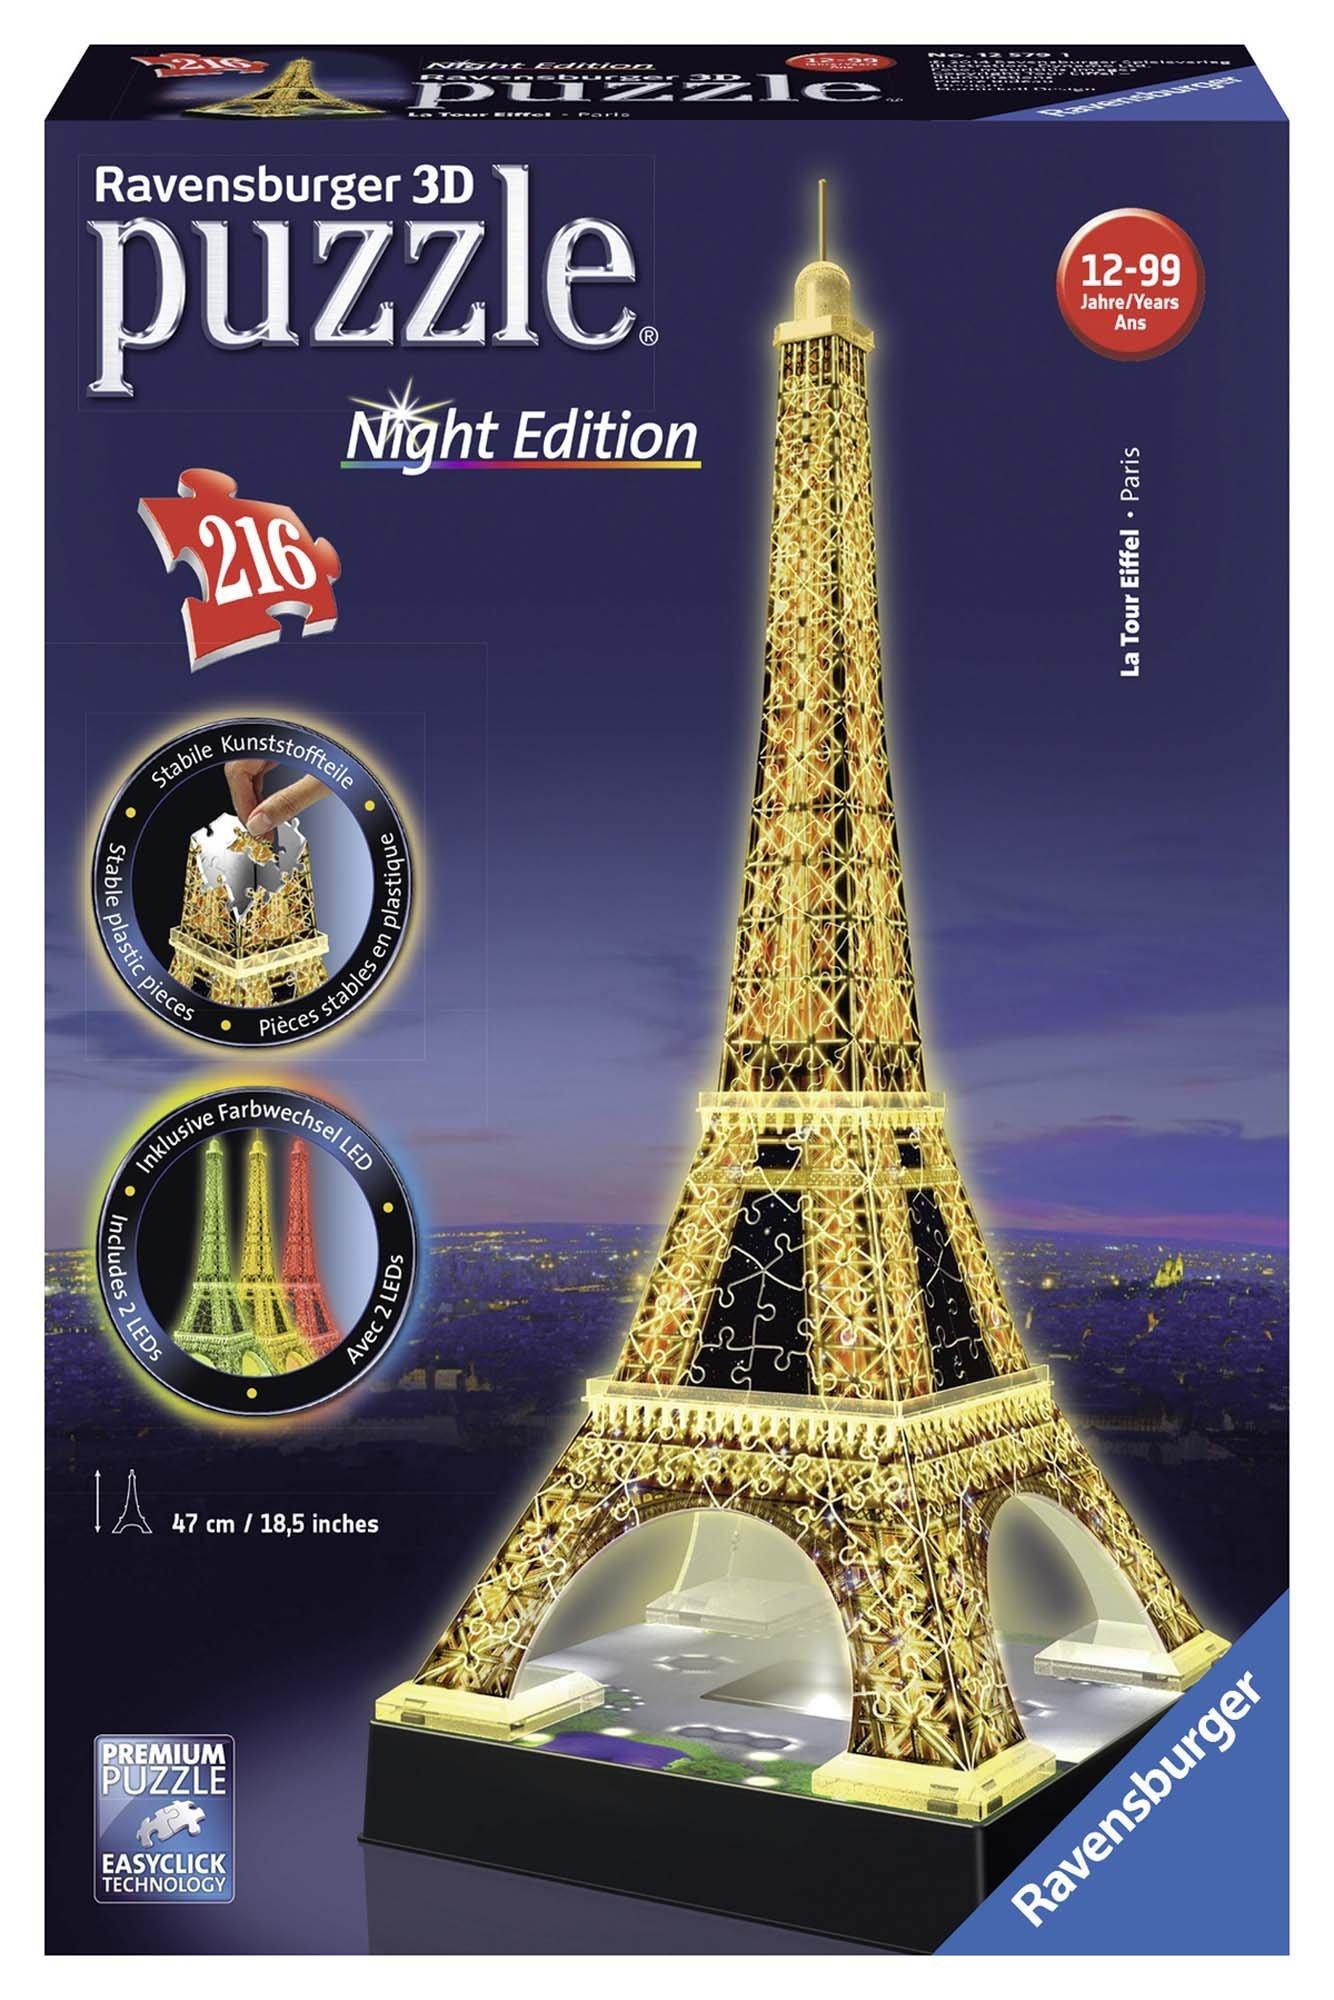 Ravensburger- Tour Torre Eiffel Puzzle 3D con LED, Edizione Speciale Notte, 216 Pezzi, Multicolore, 12579 1 spesavip